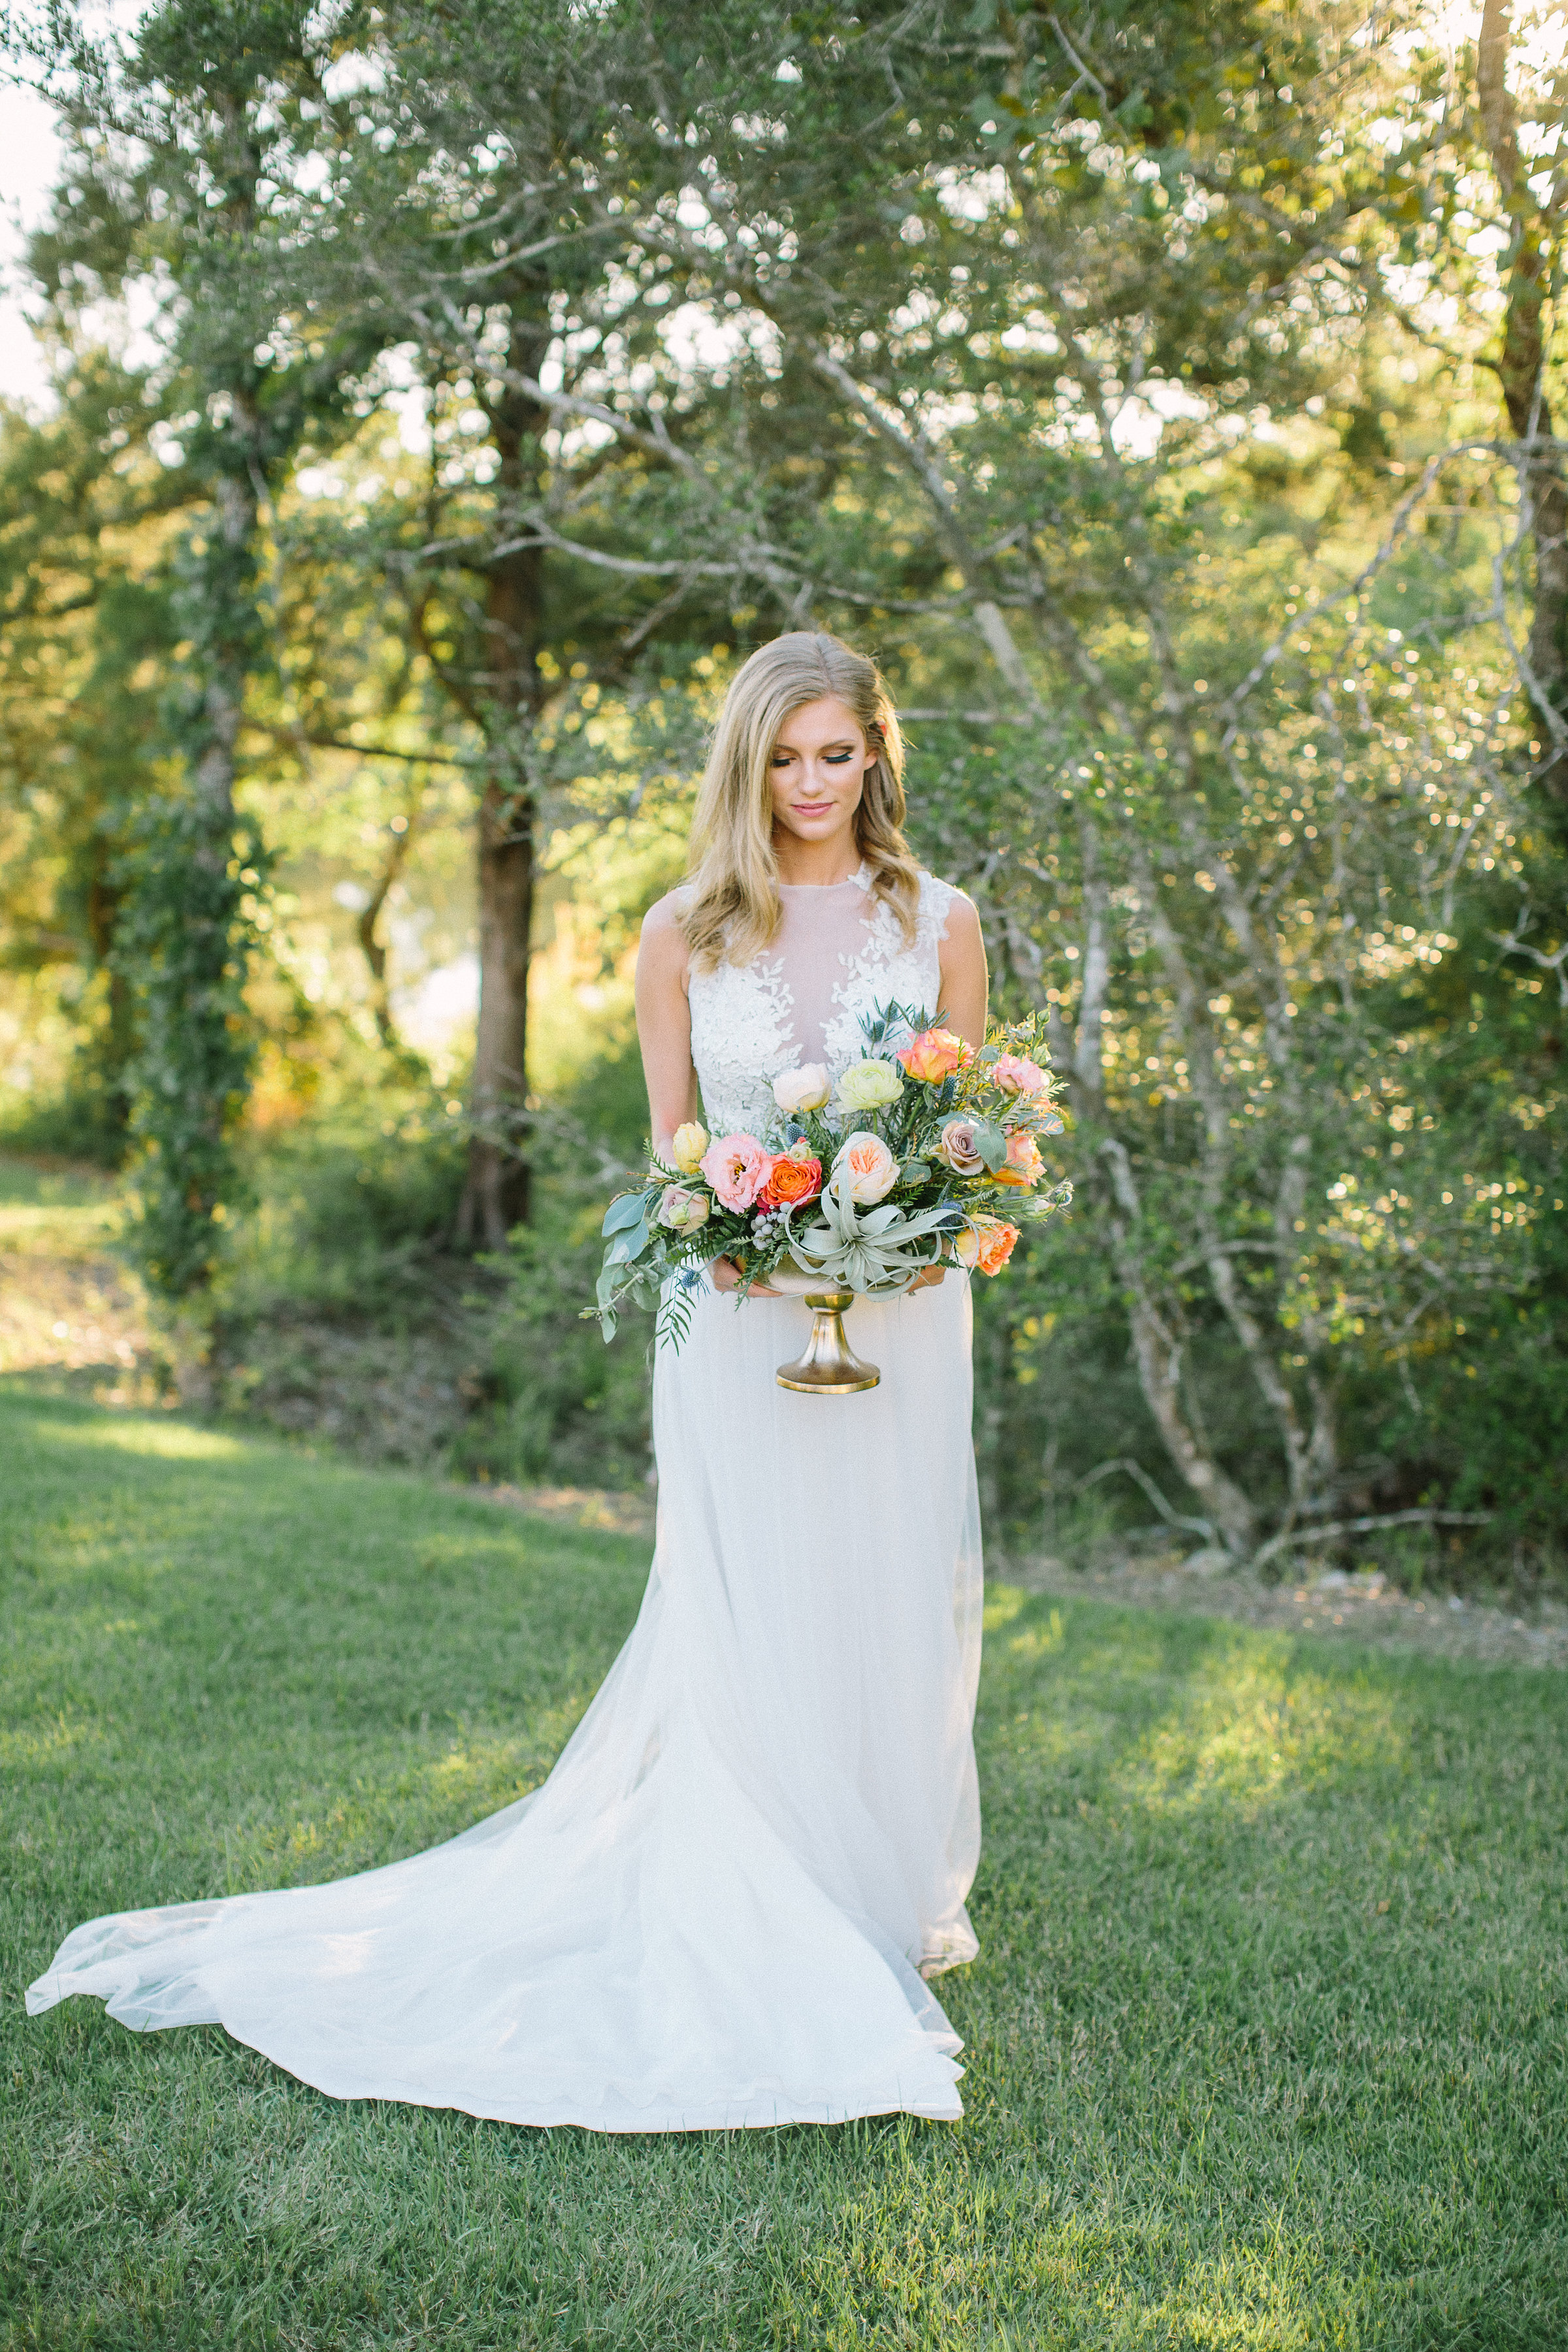 Ellen-Ashton-Photography-Peach-Creek-Ranch-Weddings-Wed-and-Prosper262